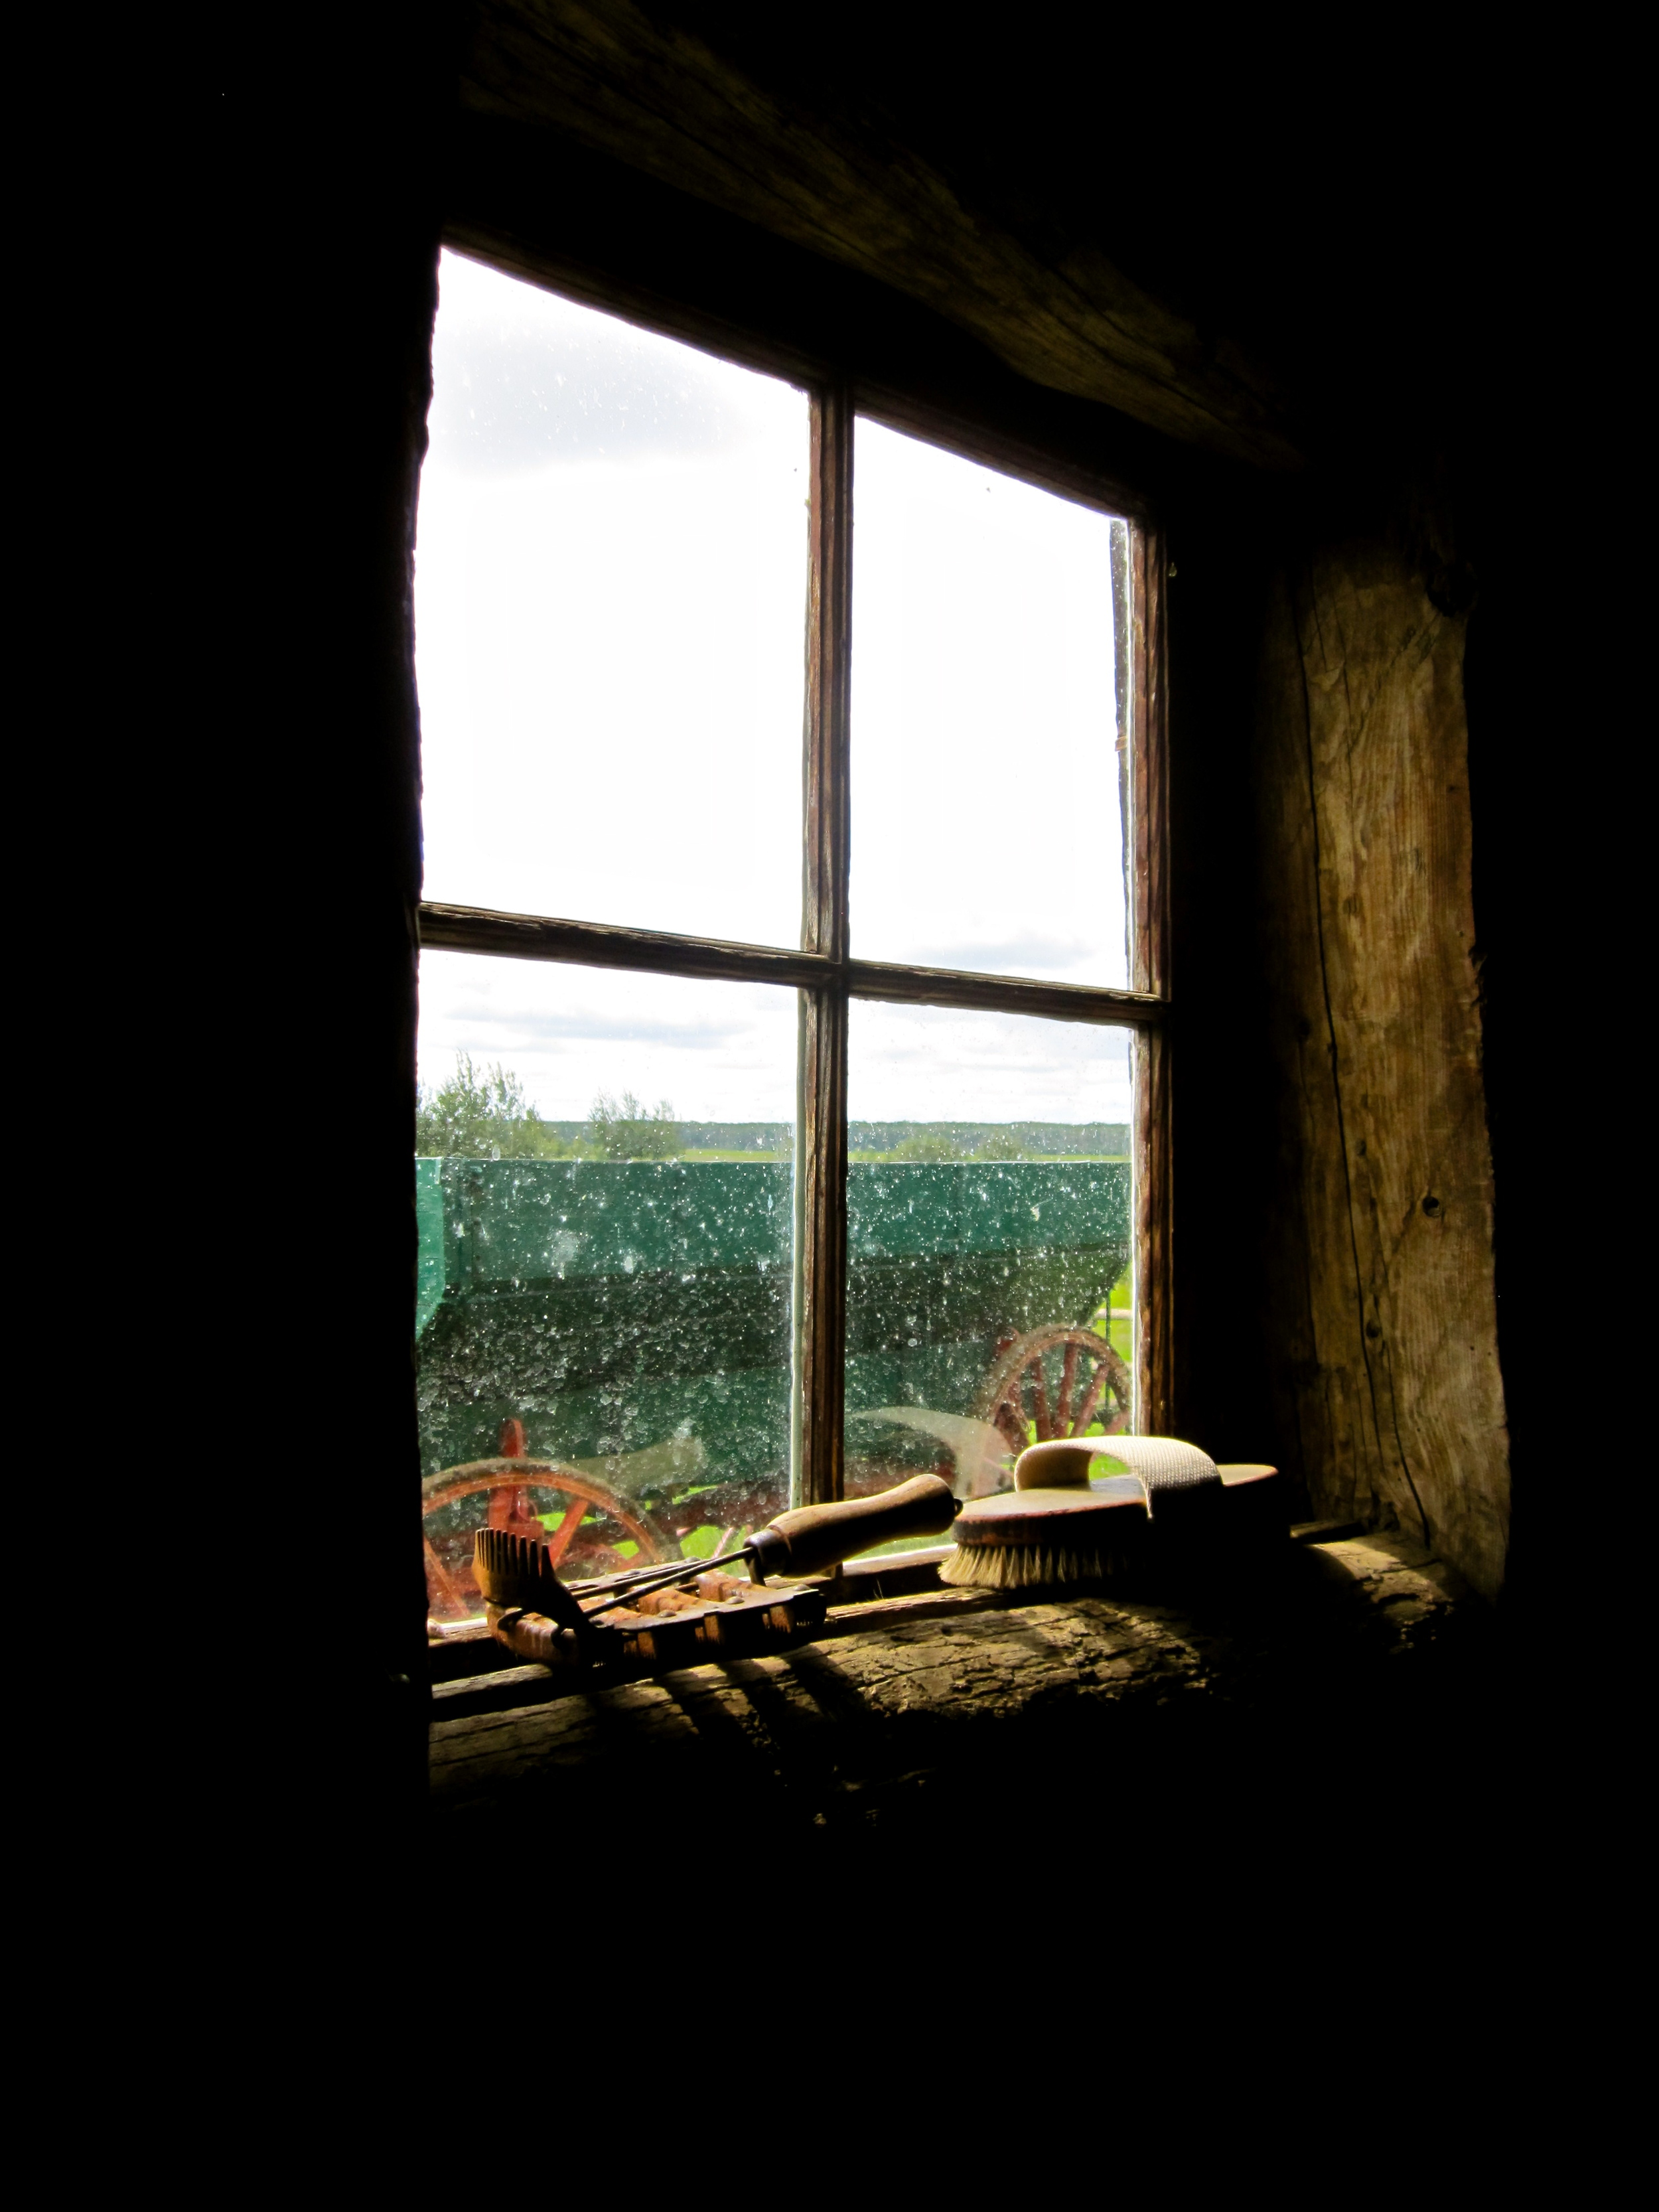 The Barn Window                    Alberta, Canada